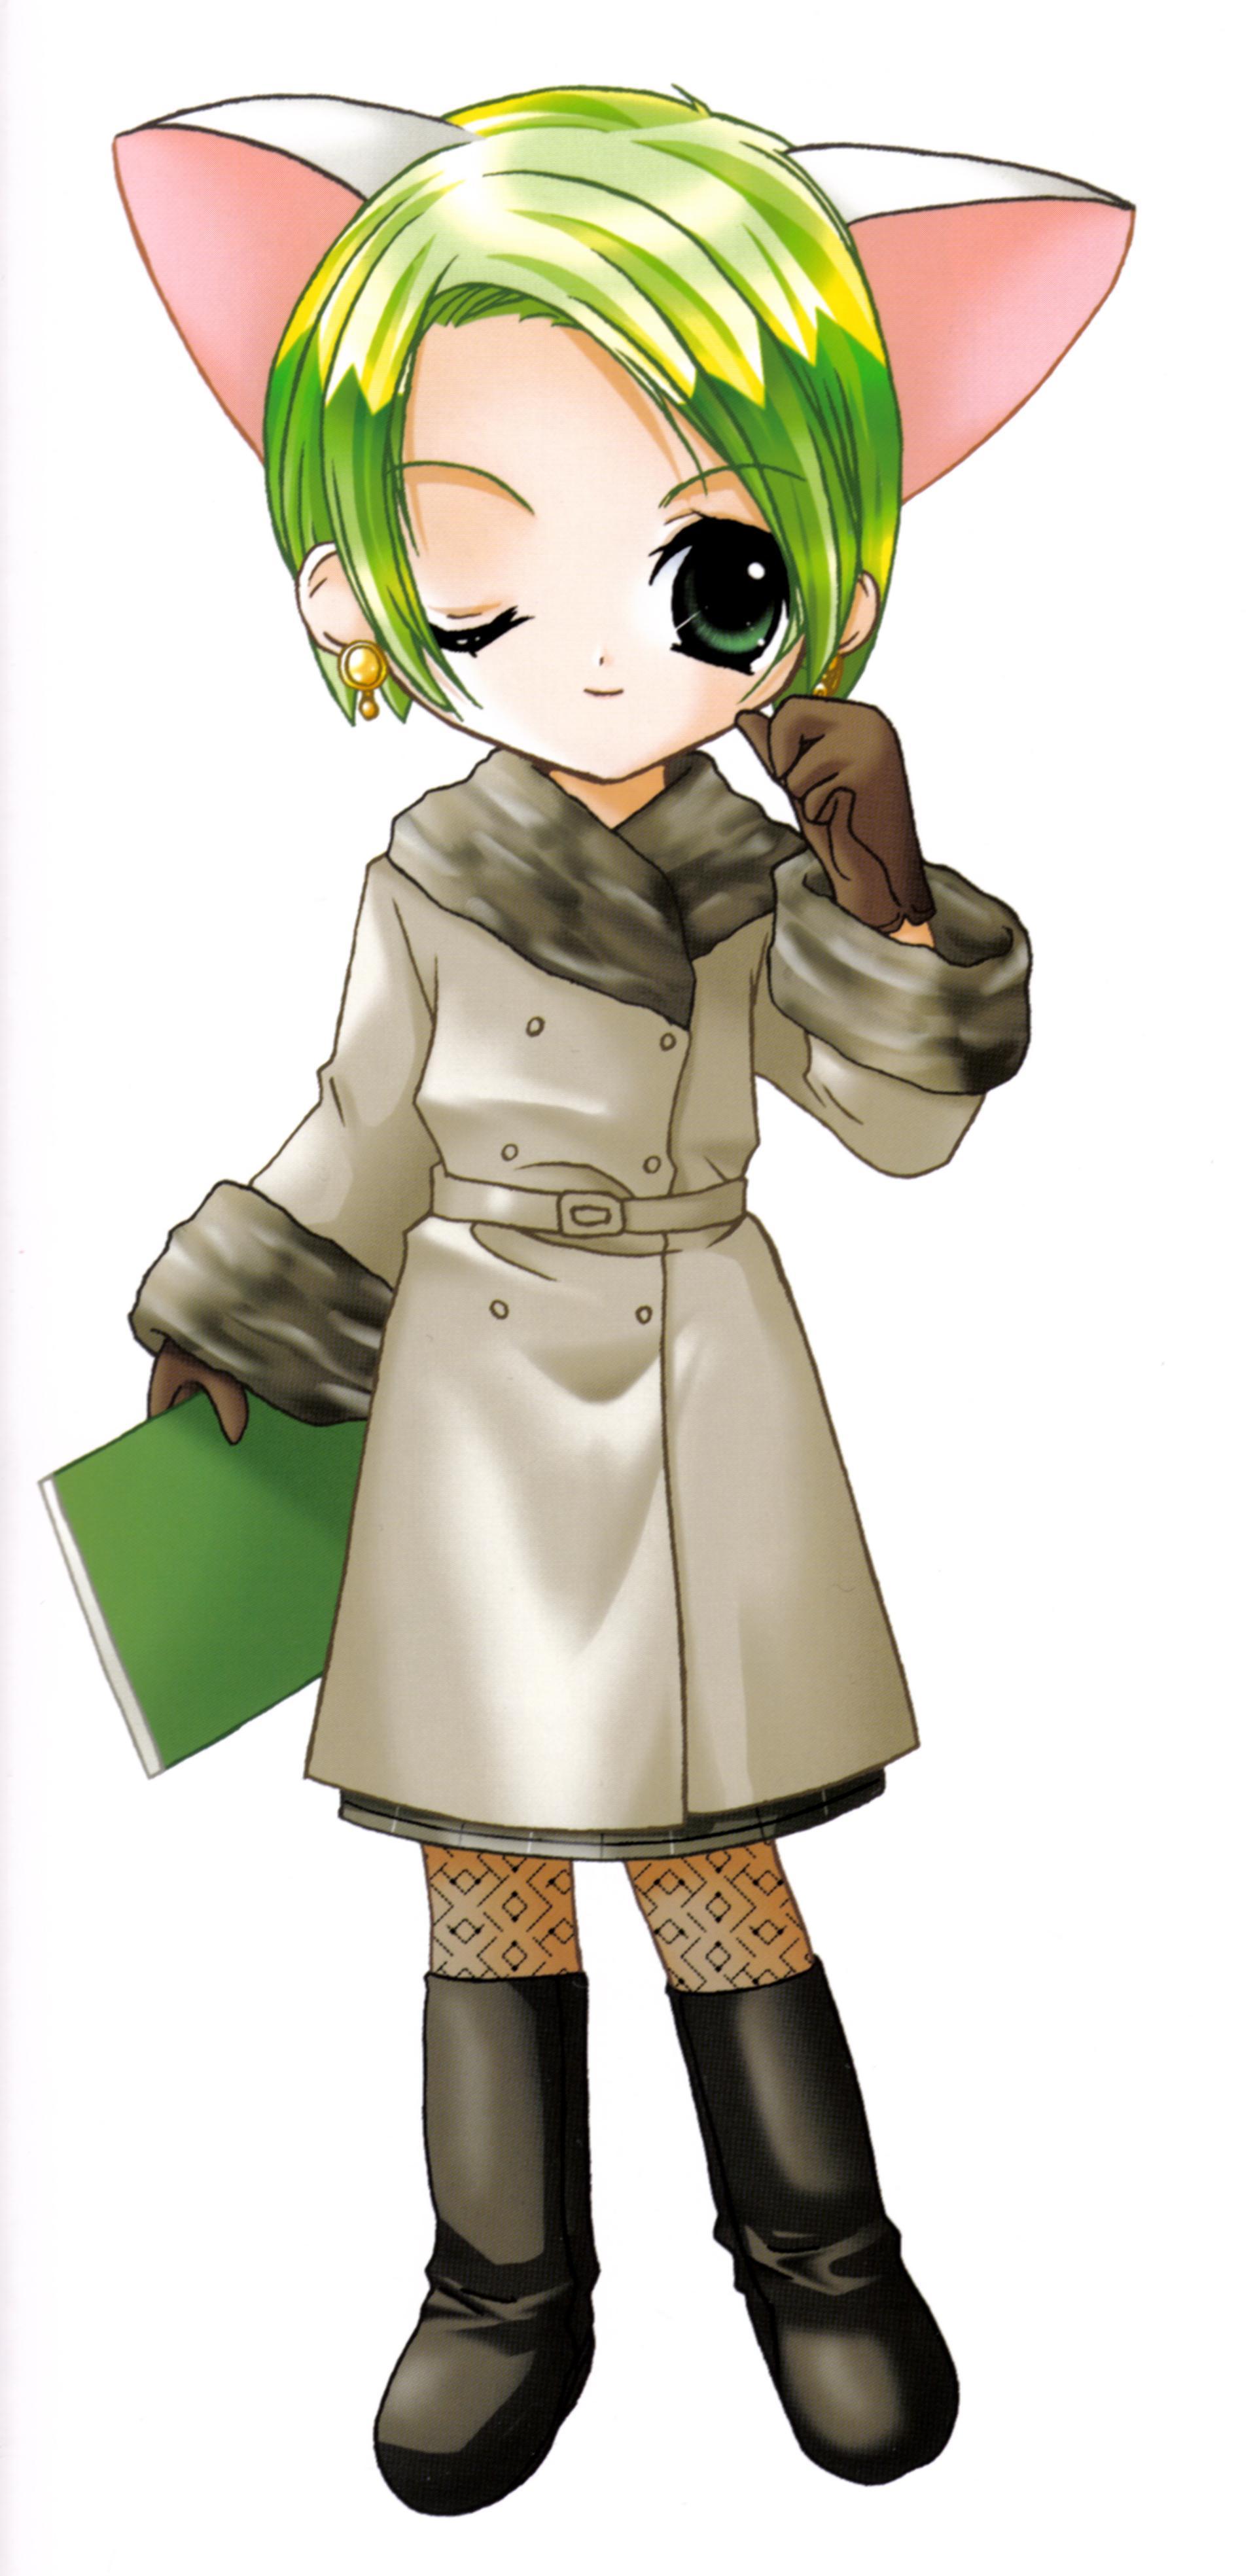 di gi charat green hair page 6 zerochan anime image board